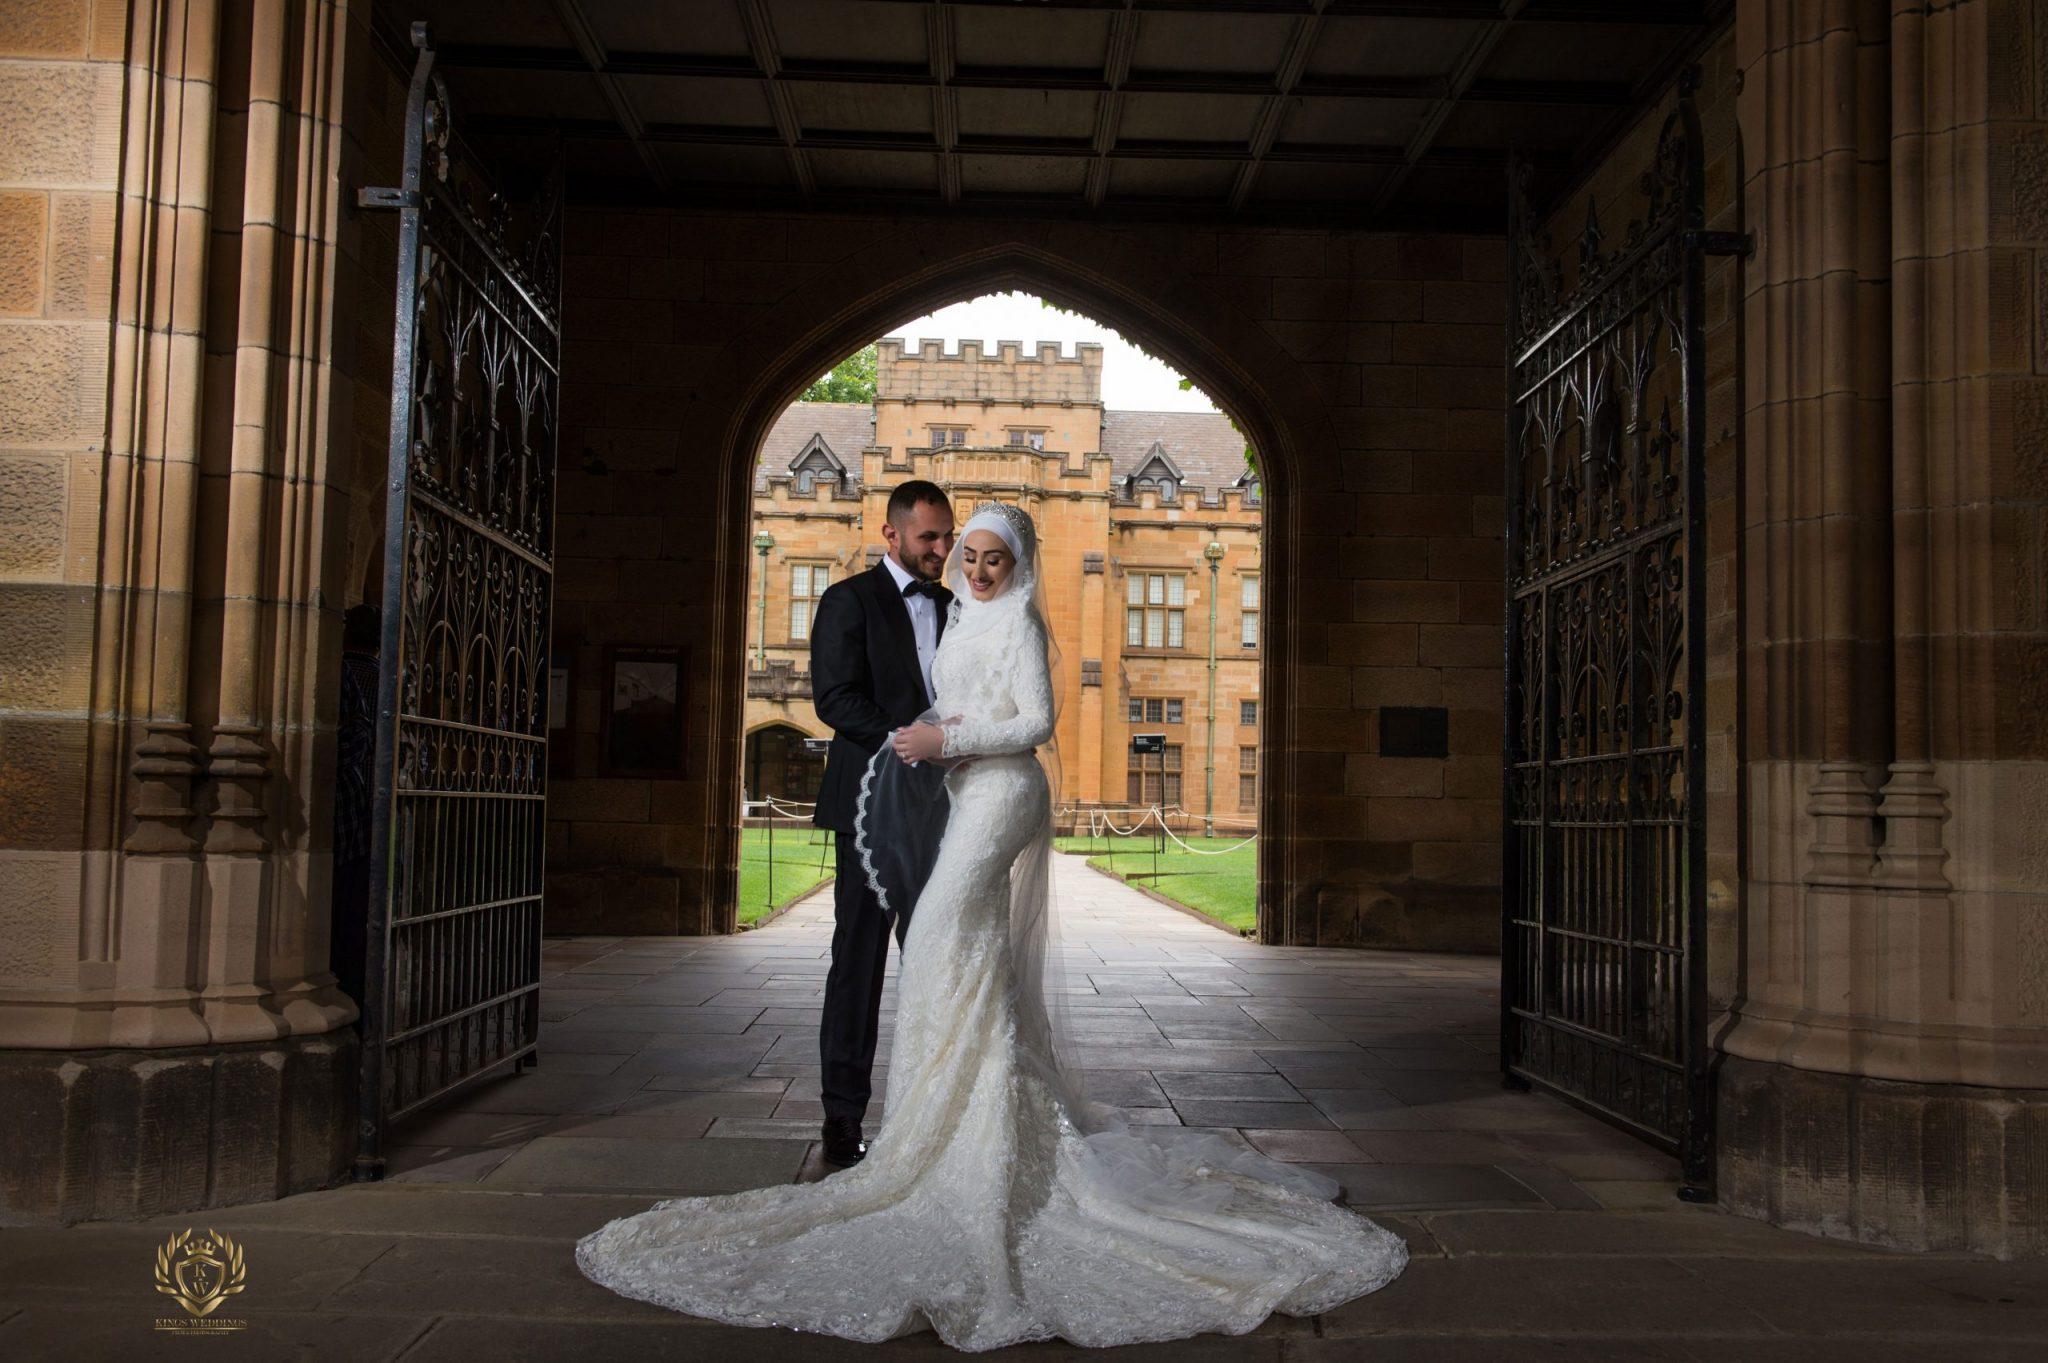 Kings Weddings Film & Photography